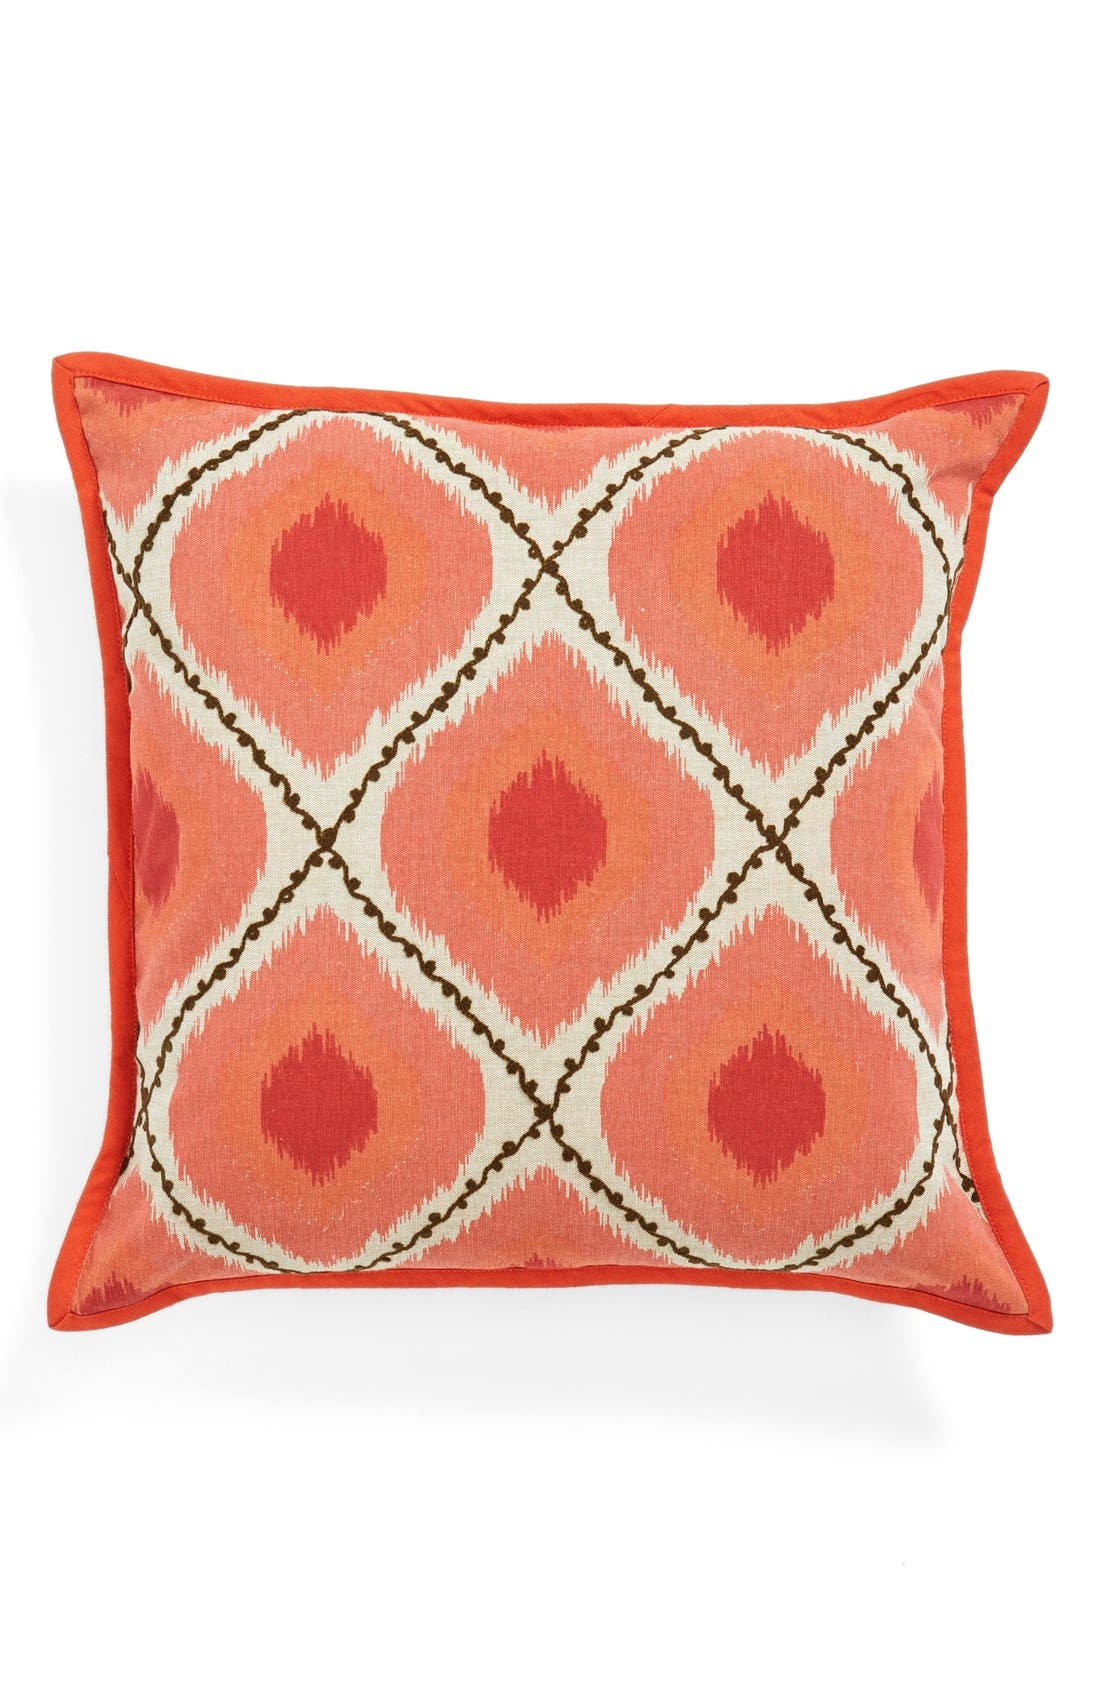 Main Image - Loloi Embroidered Ikat Pillow